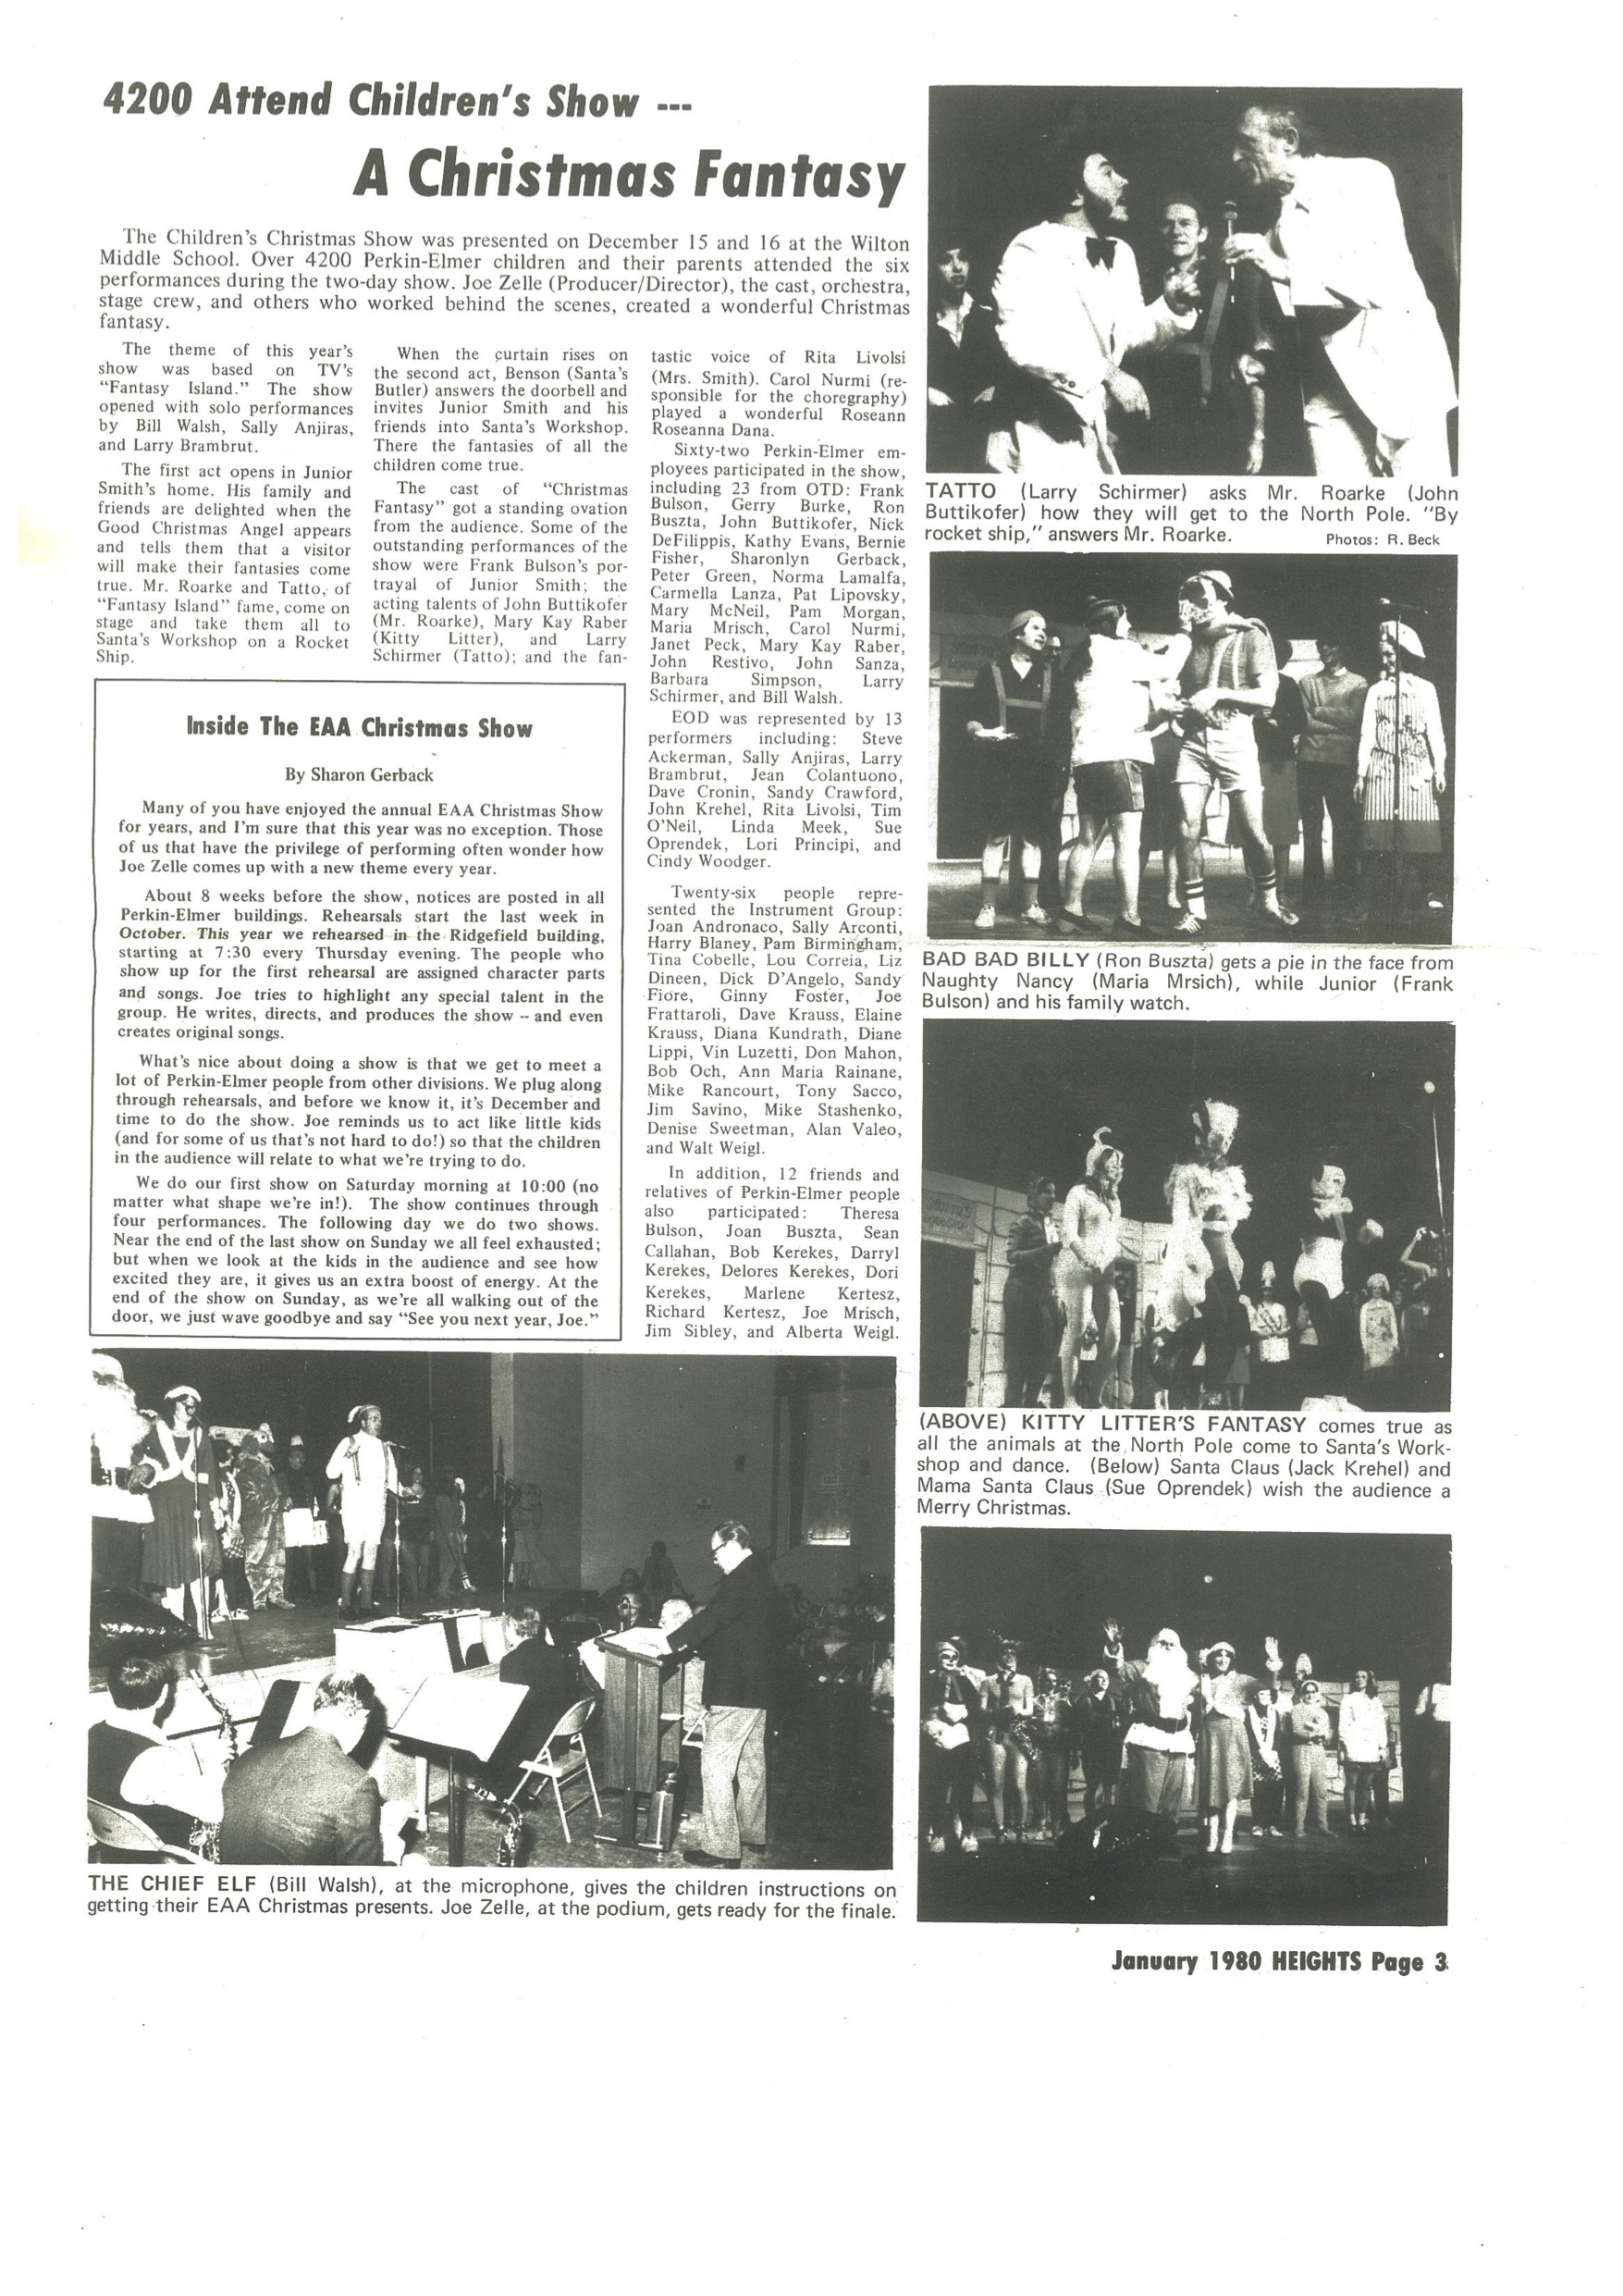 vol 13 num 4, page 3.jpg